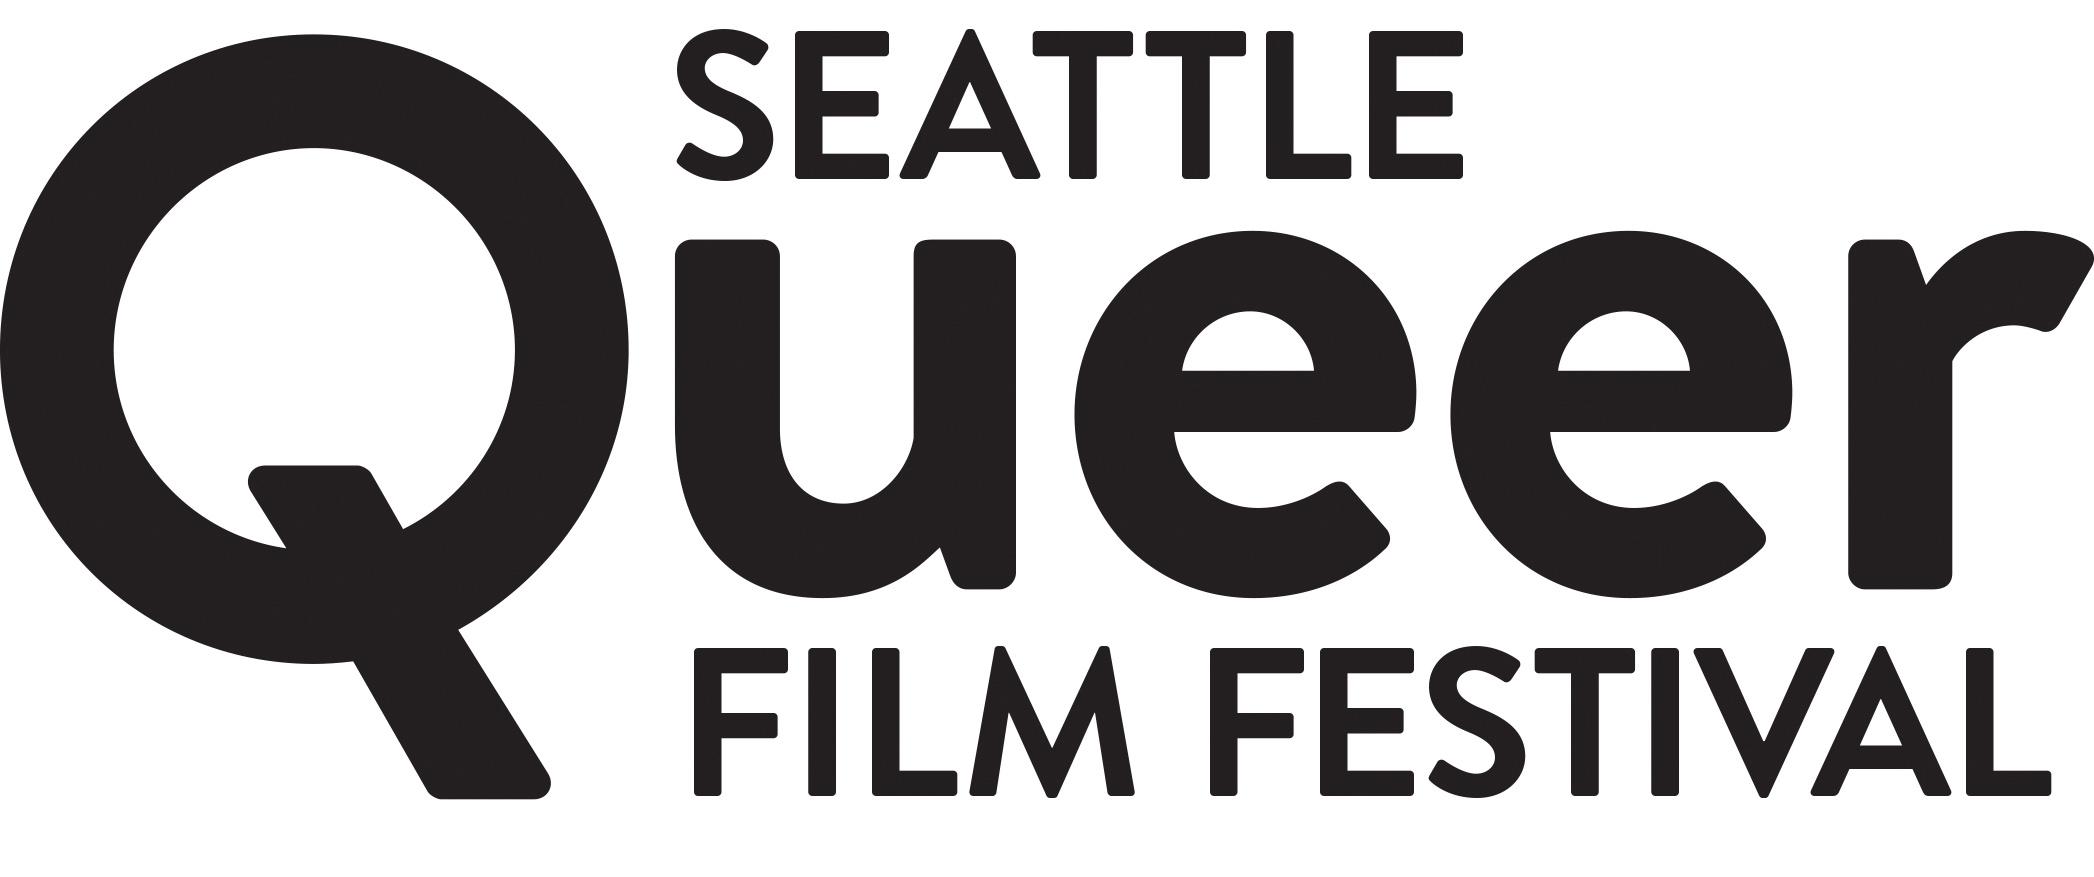 Seattle Queer Film Festival (produced by Three Dollar Bill Cinema)